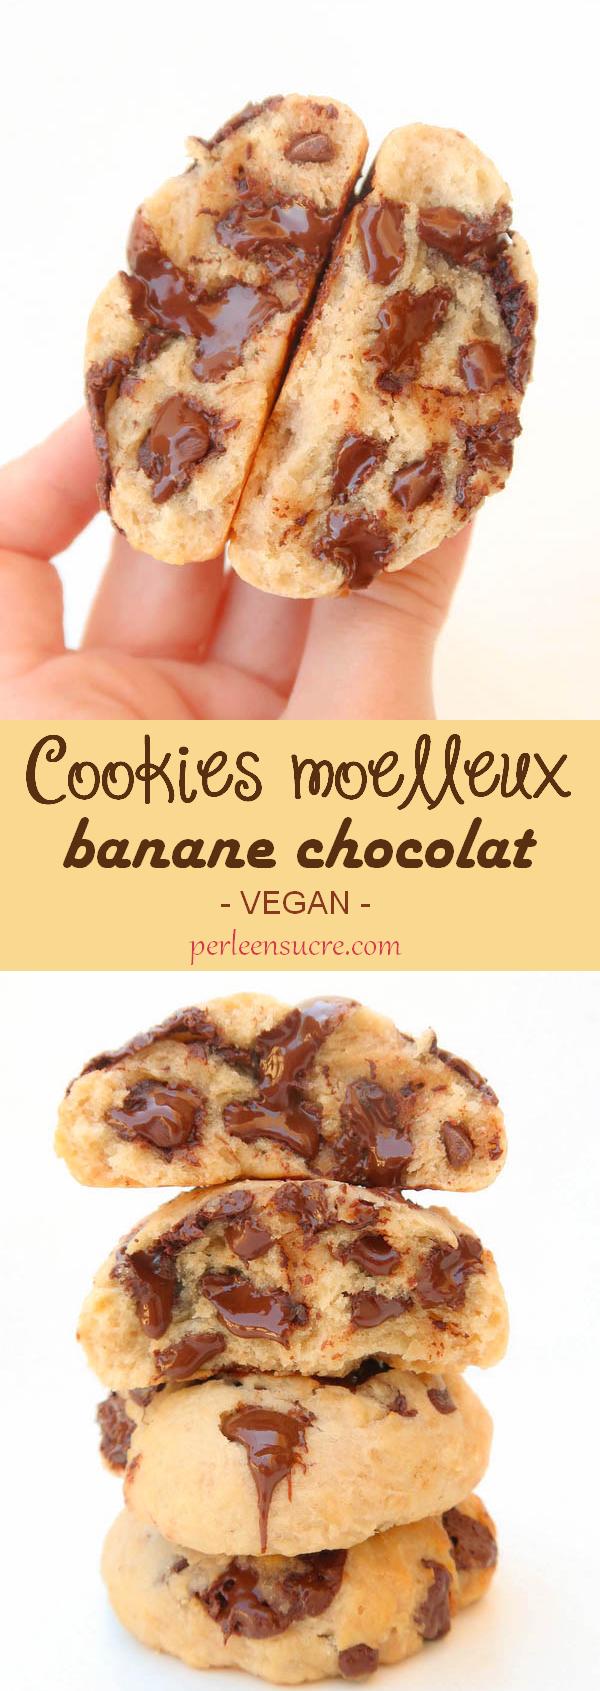 Cookies moelleux banane chocolat {vegan